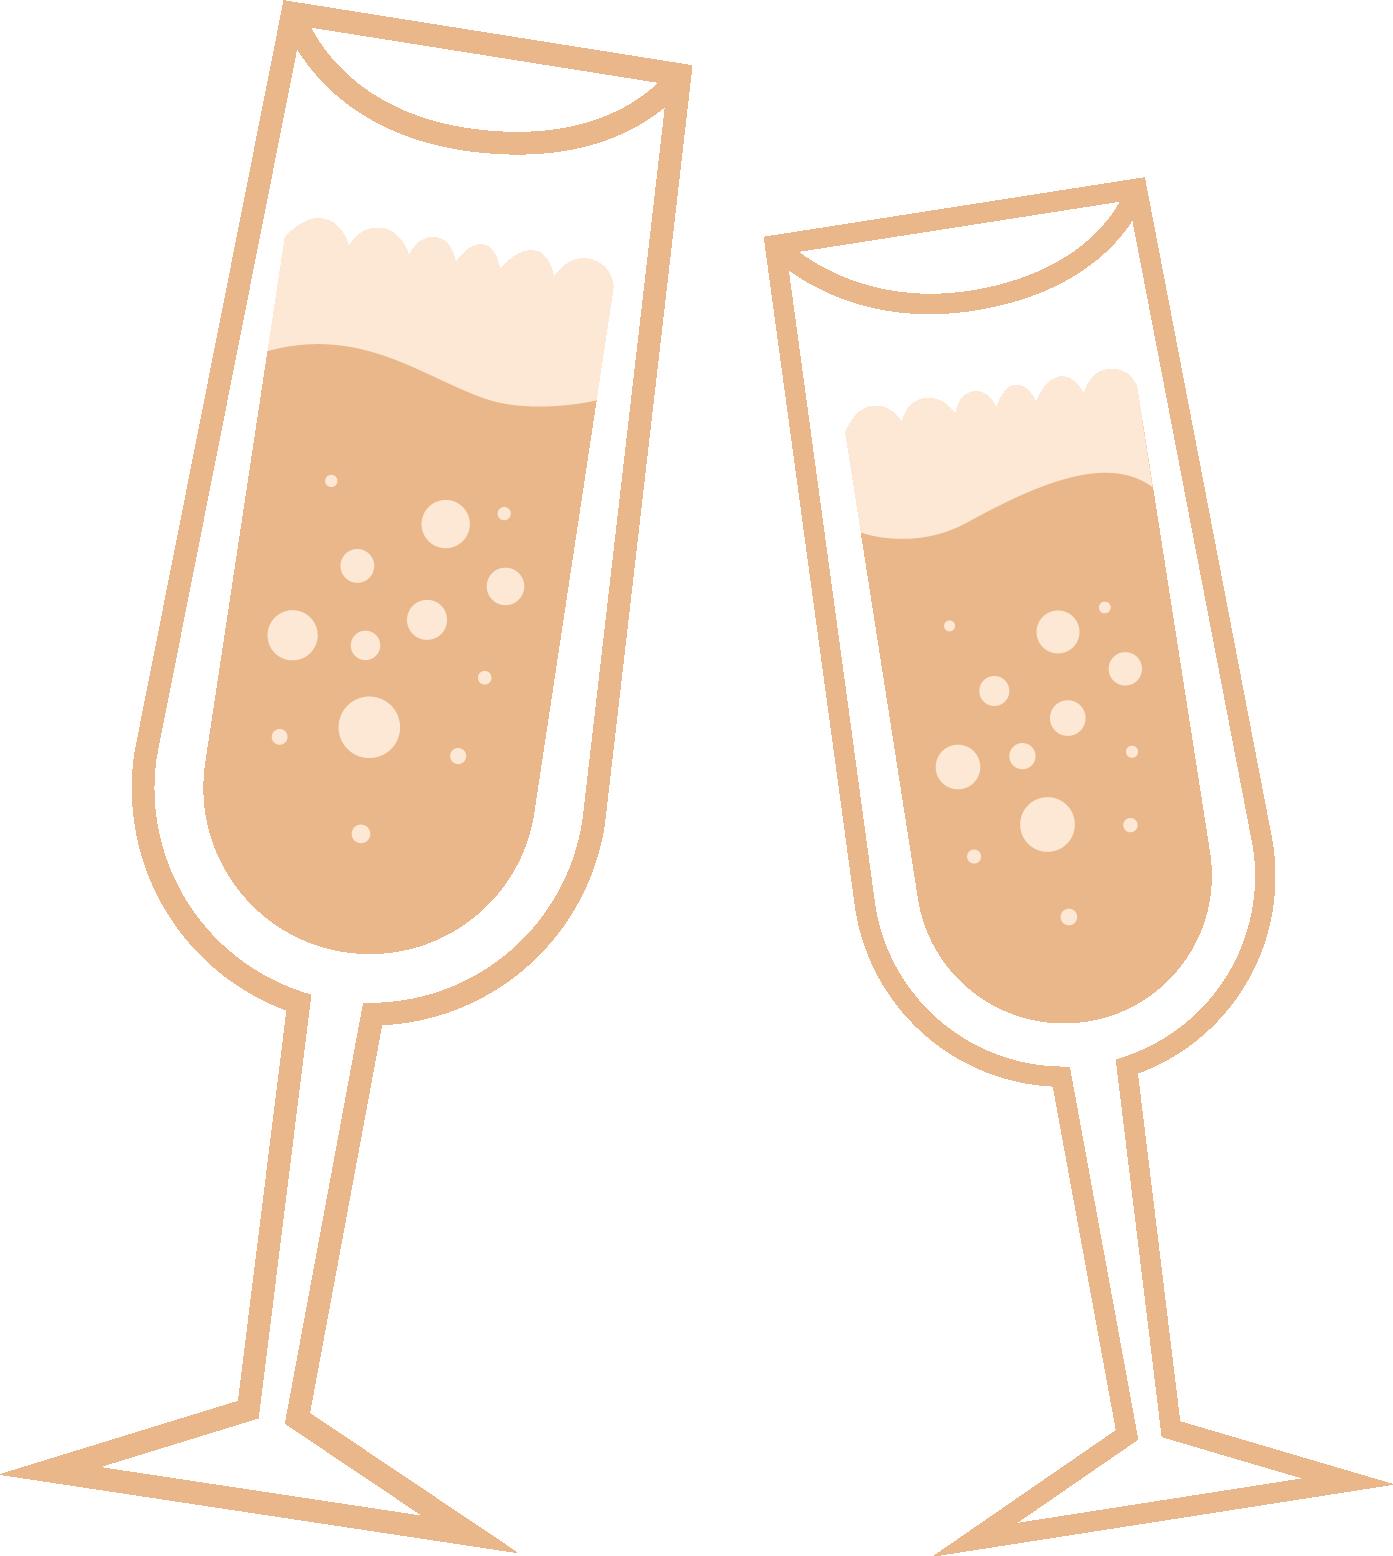 Champagne glass clip art. Pineapple clipart wine